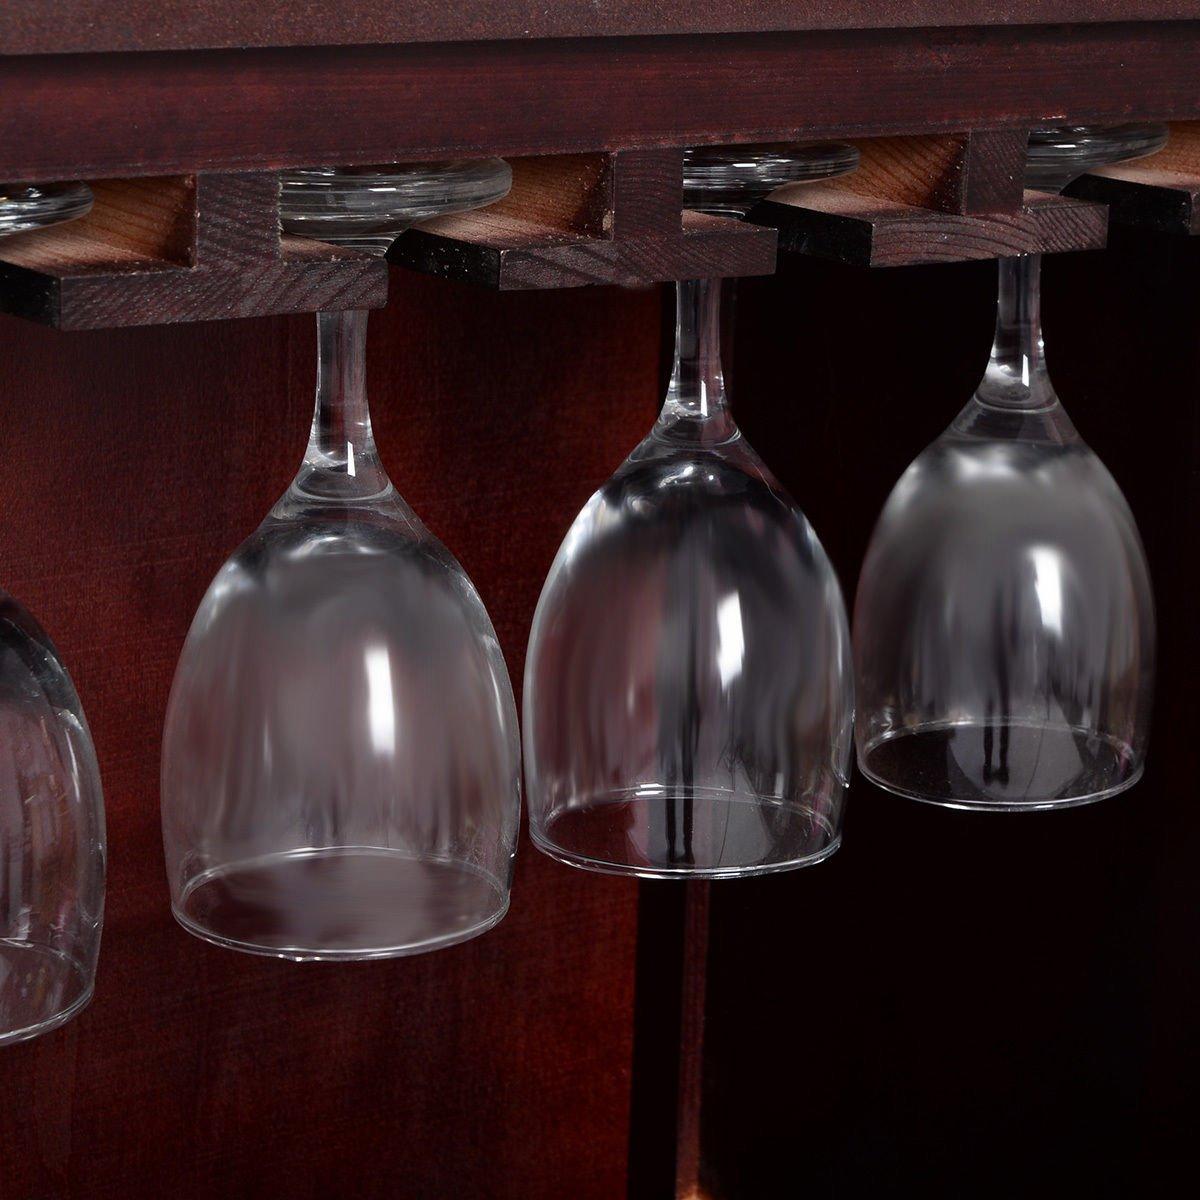 New Wine Wooden Cabinet Bottle Holder Storage Kitchen Home Bar w/ Glass Rack by Unknown (Image #5)